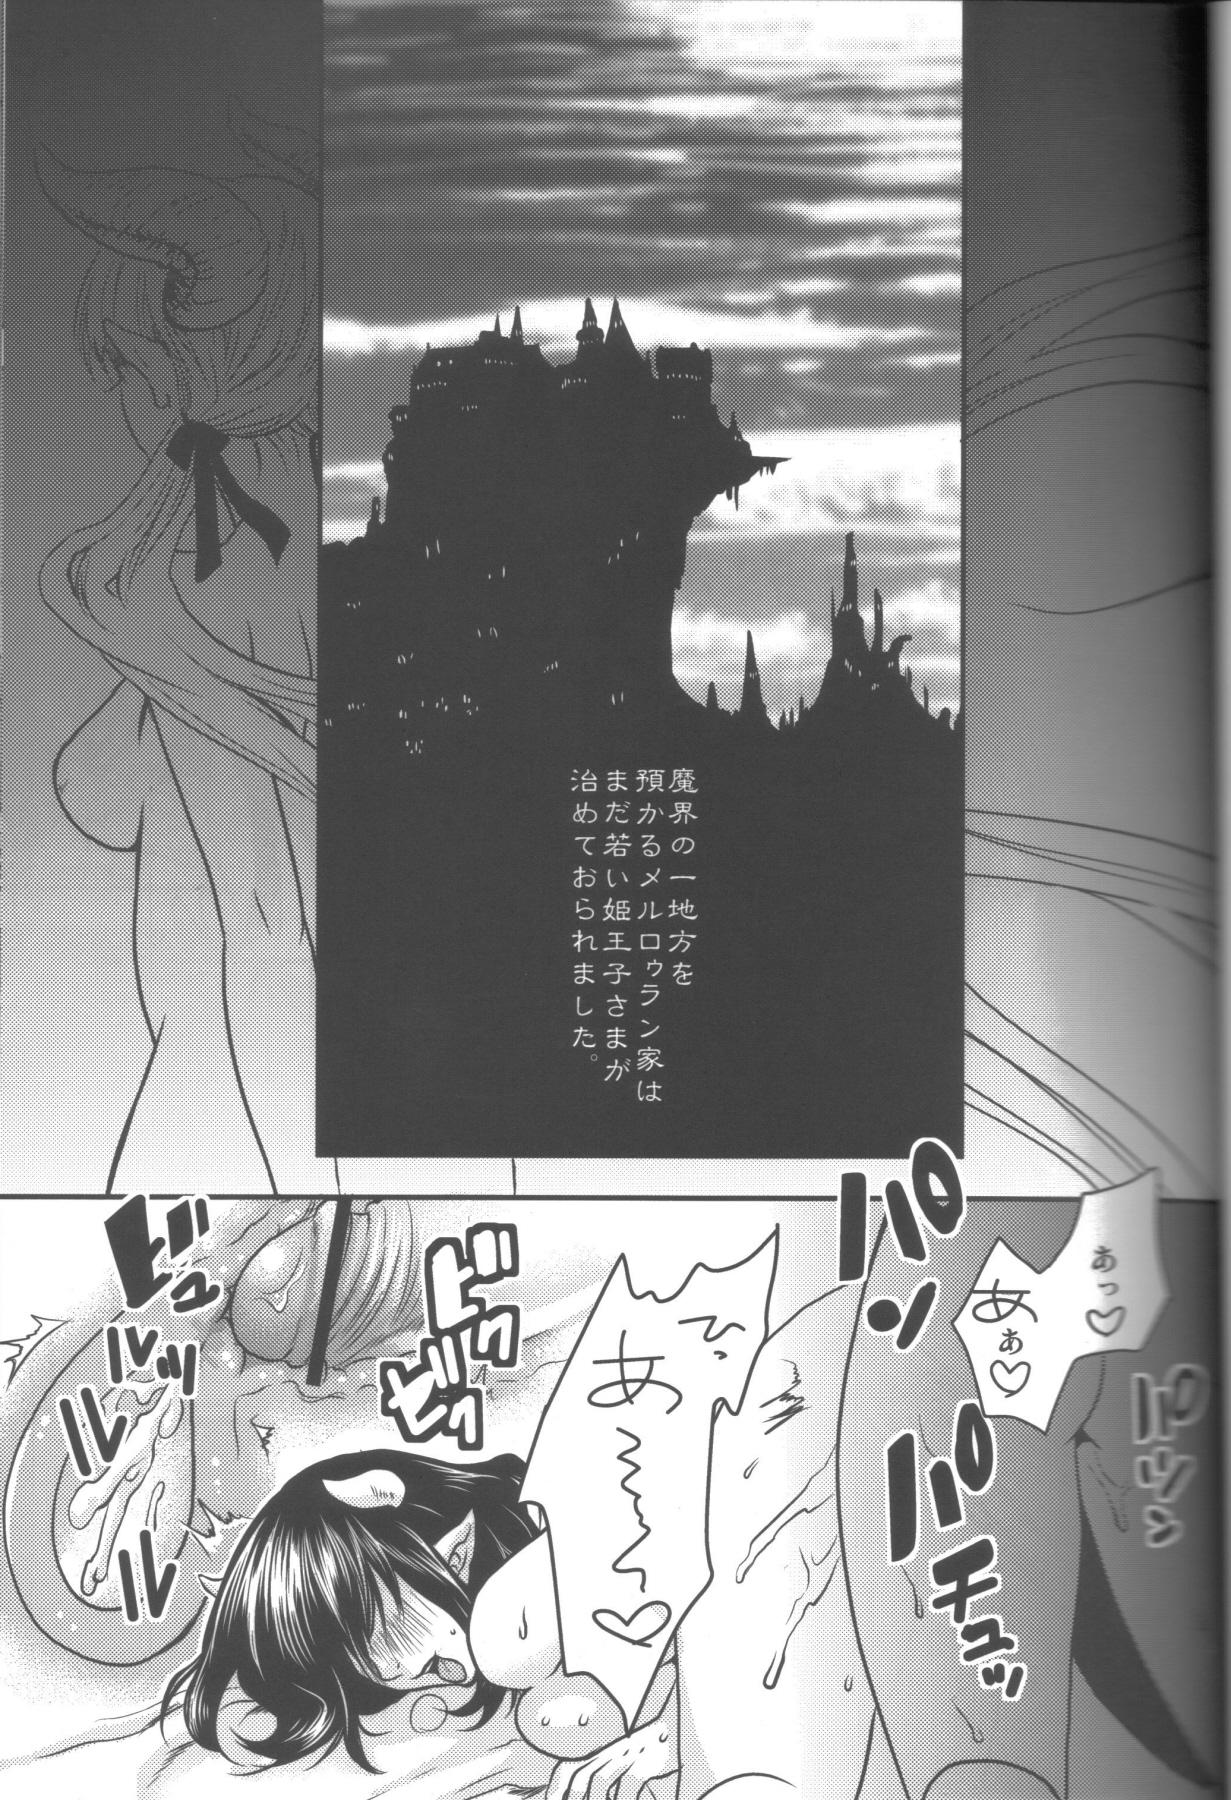 (C78) [Pish Lover (Amatake Akewo)] Hime Ouji-sama wa Harami-goro 1